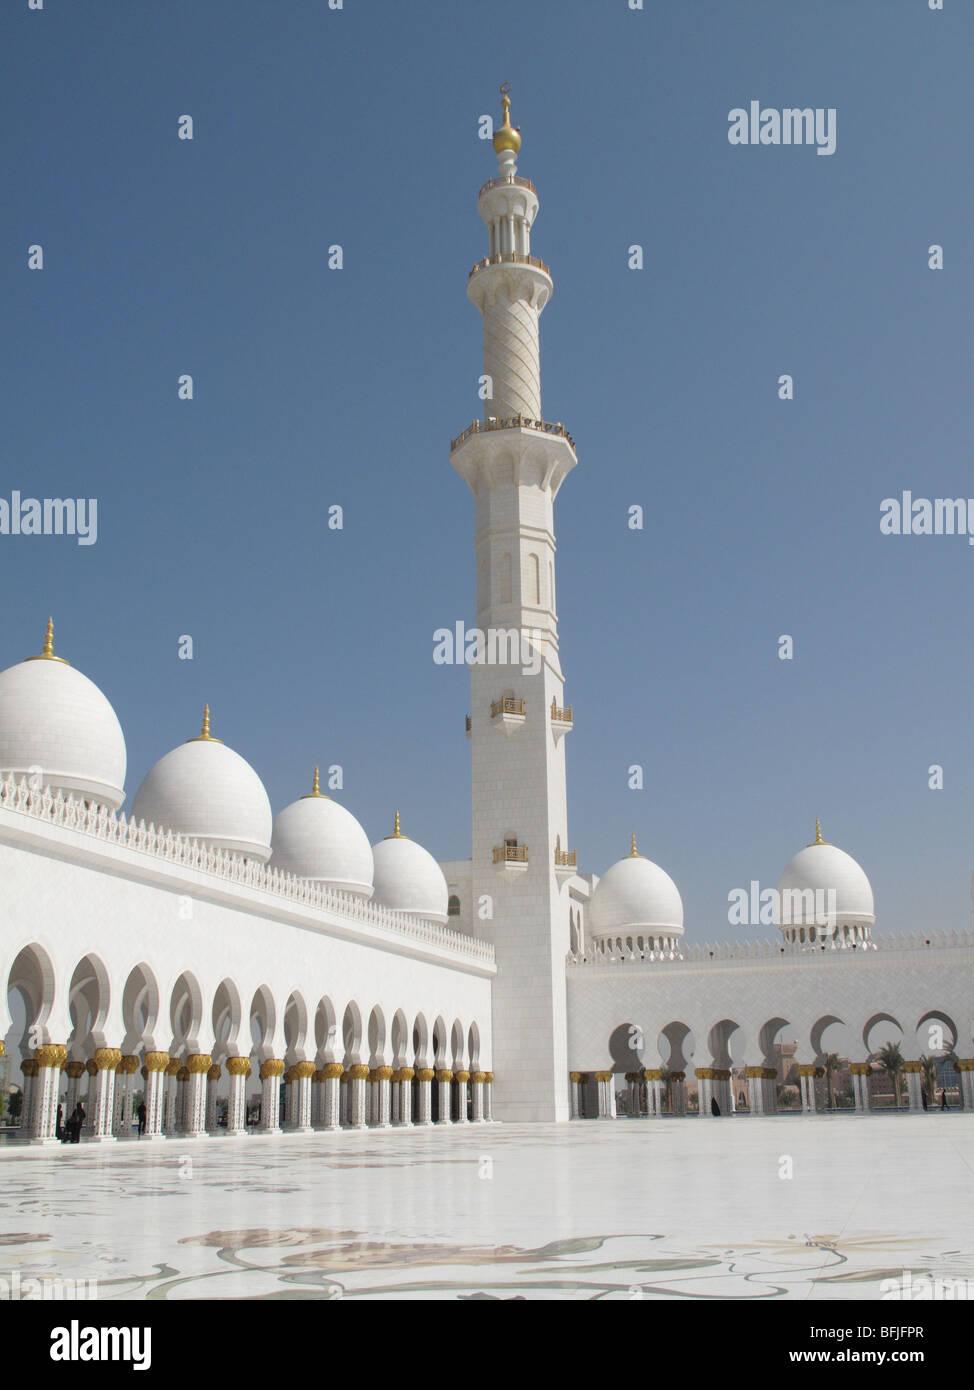 Minarett, dome and walkway at Sheikh Zayed Bin Sultan Al Nahyan Mosque, Abu Dhabi - Stock Image